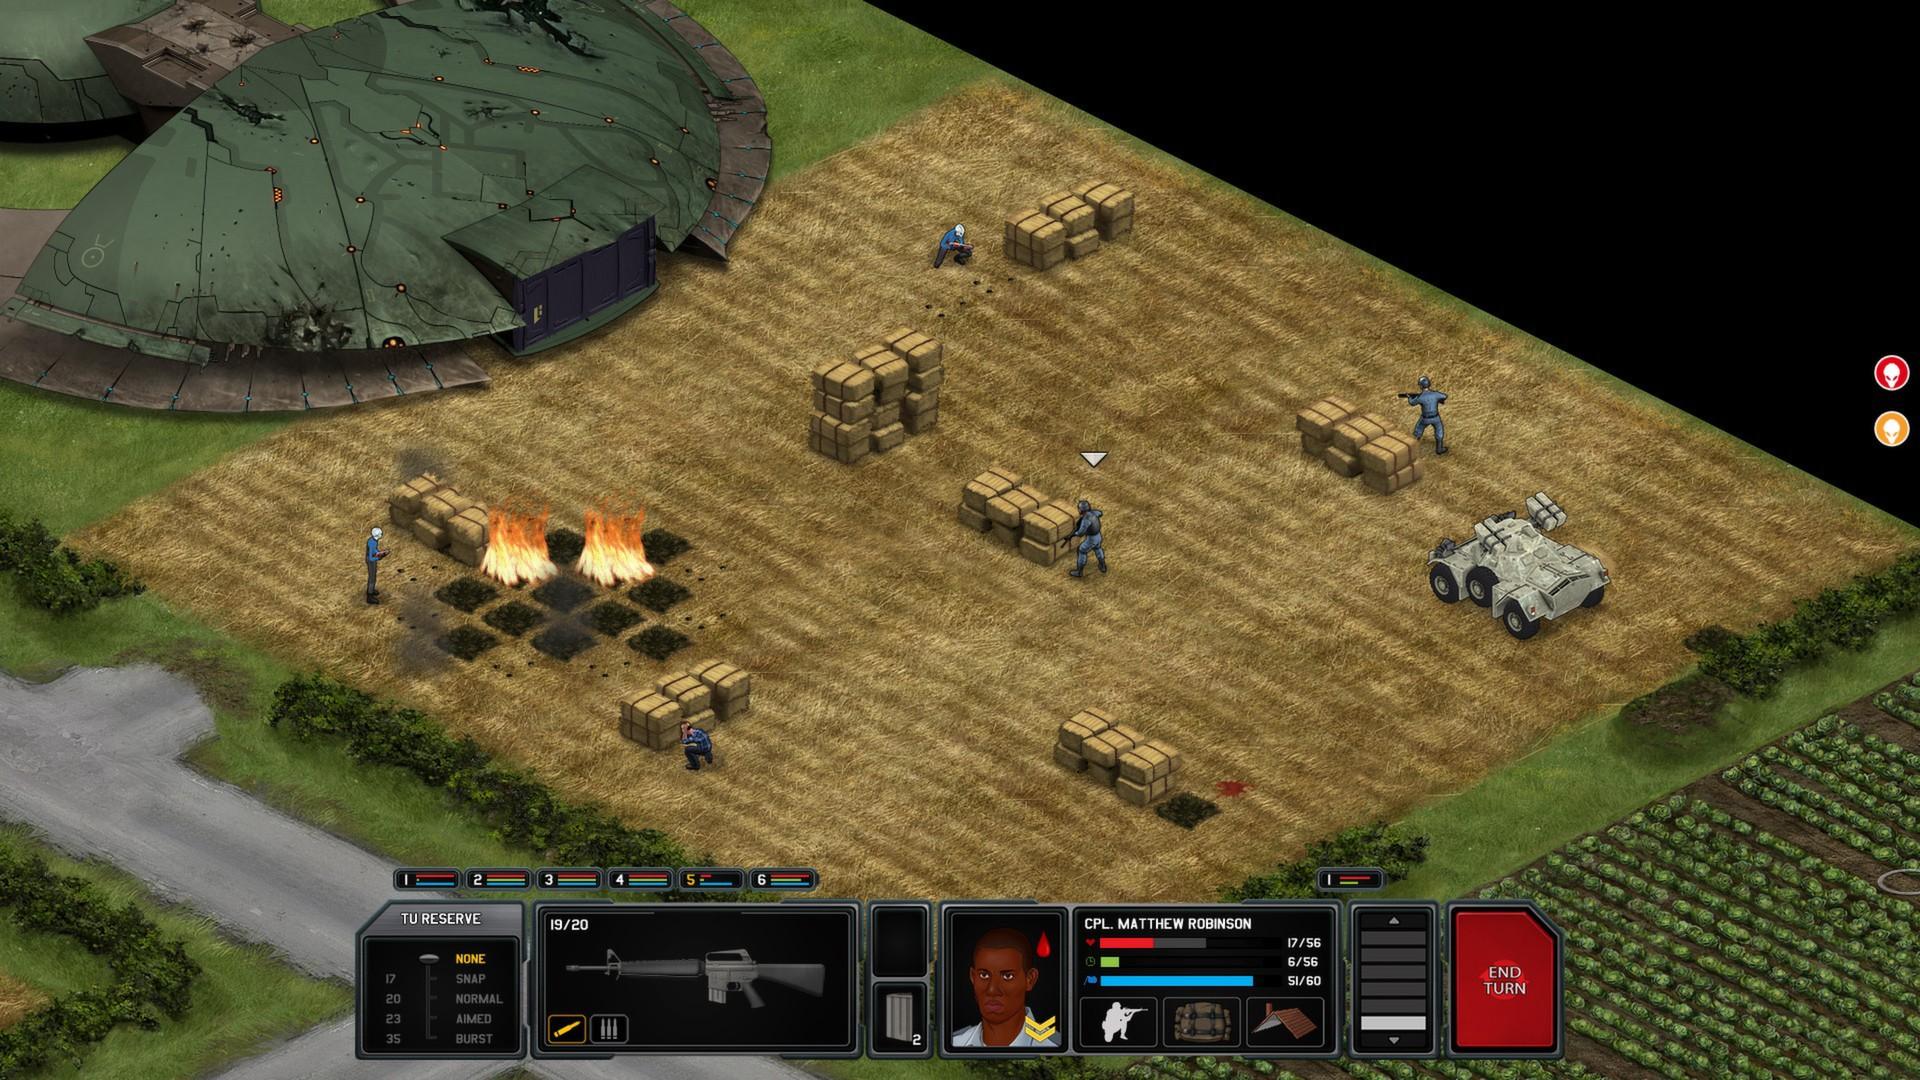 Xenonauts-CODEX   Skidrow Games - Crack - Full Version Pc Games ...